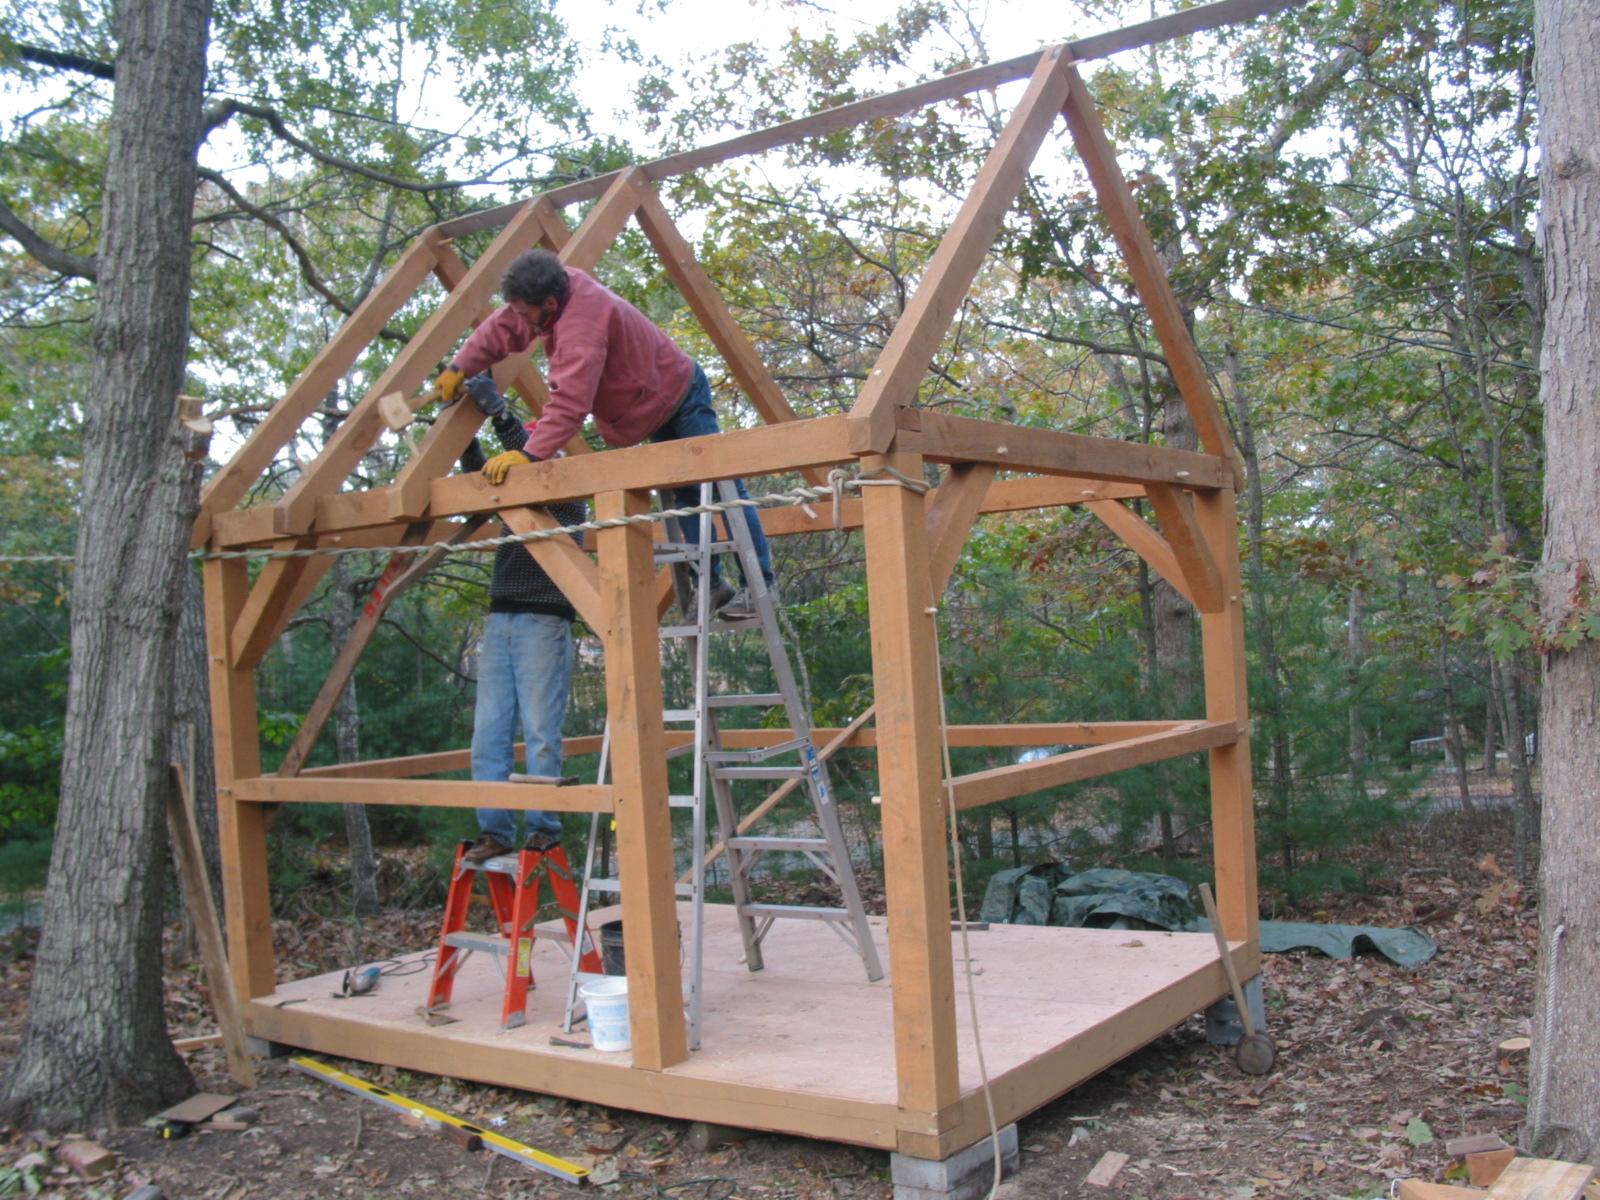 tiny frame house plans kits house design ideas frame house kits frame cabin frame house